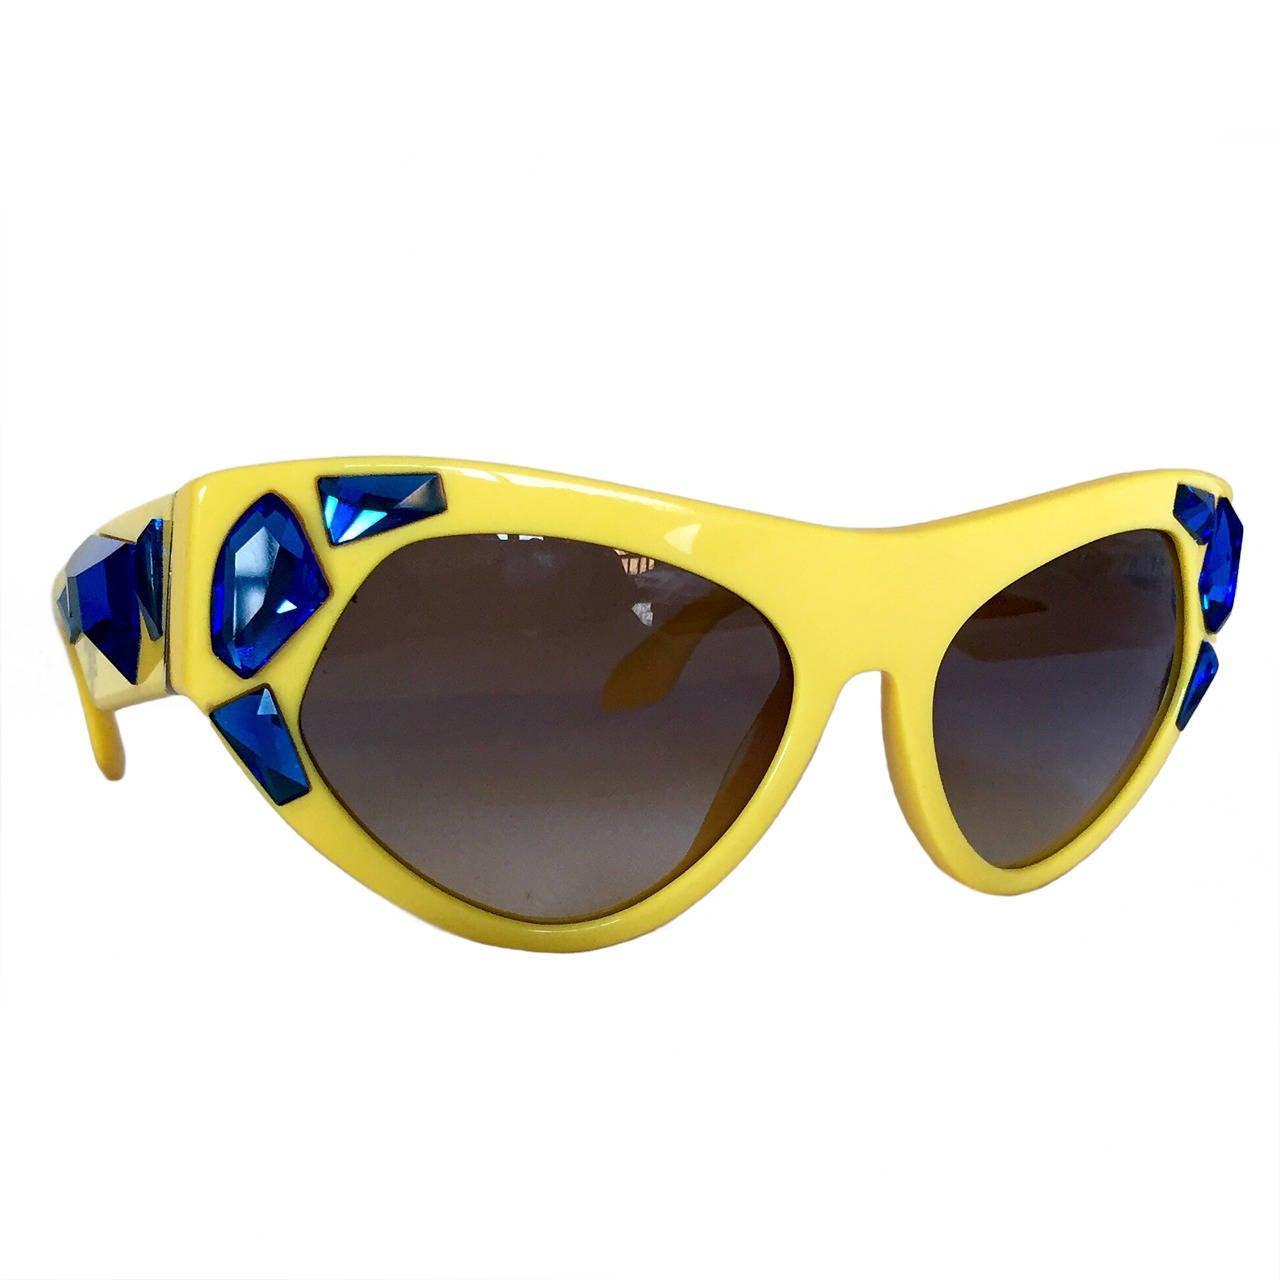 a0866c7ce591 discount impossible to find prada voice cat eye yellow sunglasses 2014  campaign 25300 e5e62